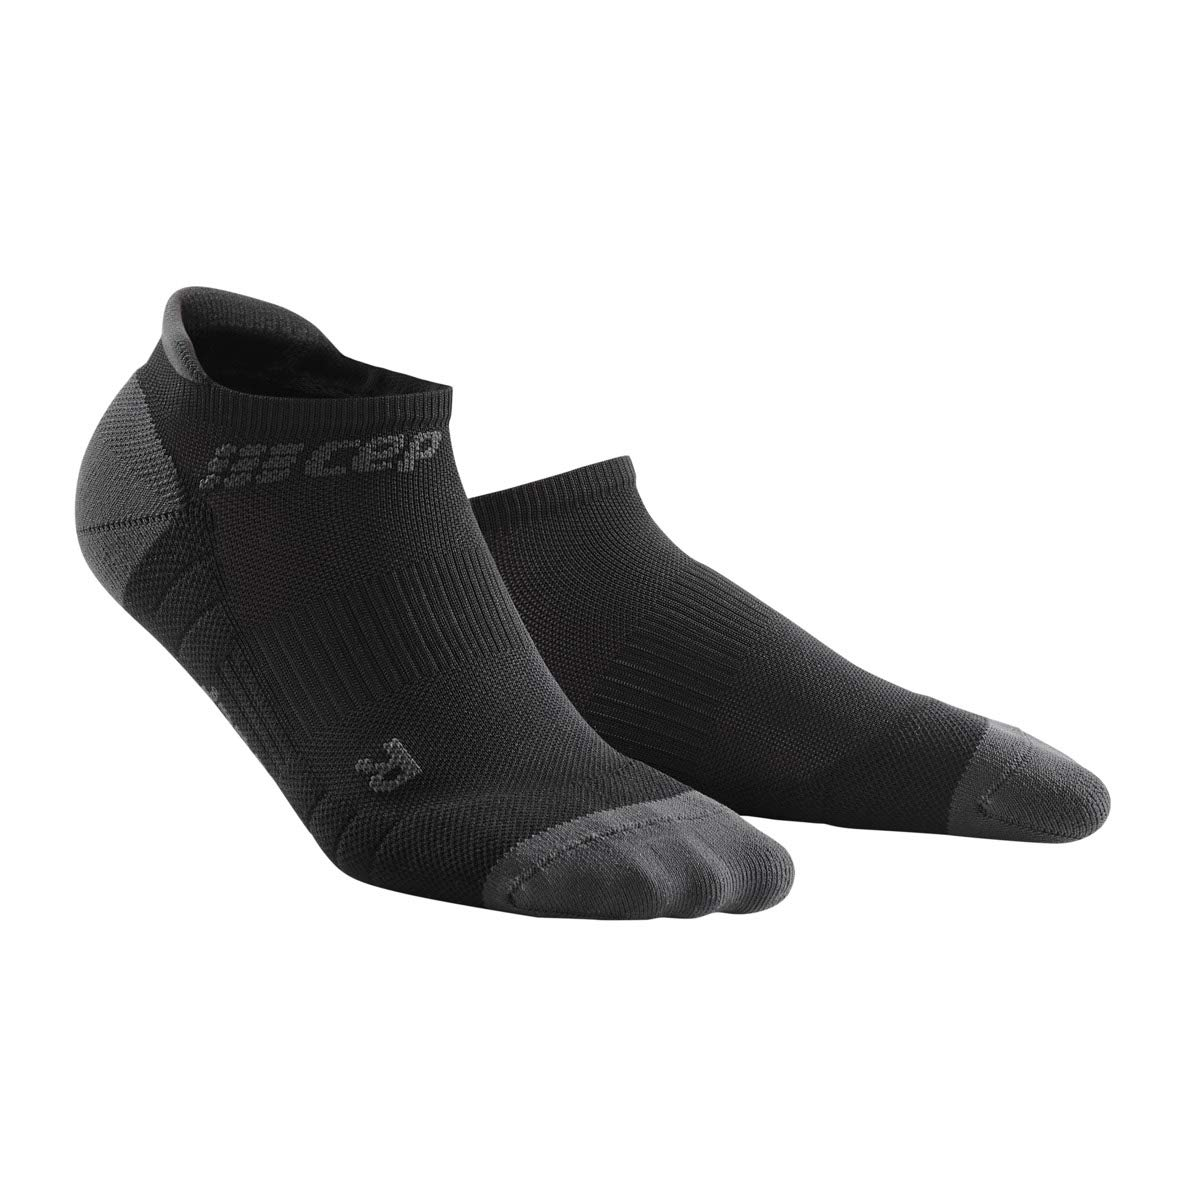 CEP Women's No Show Socks 3.0